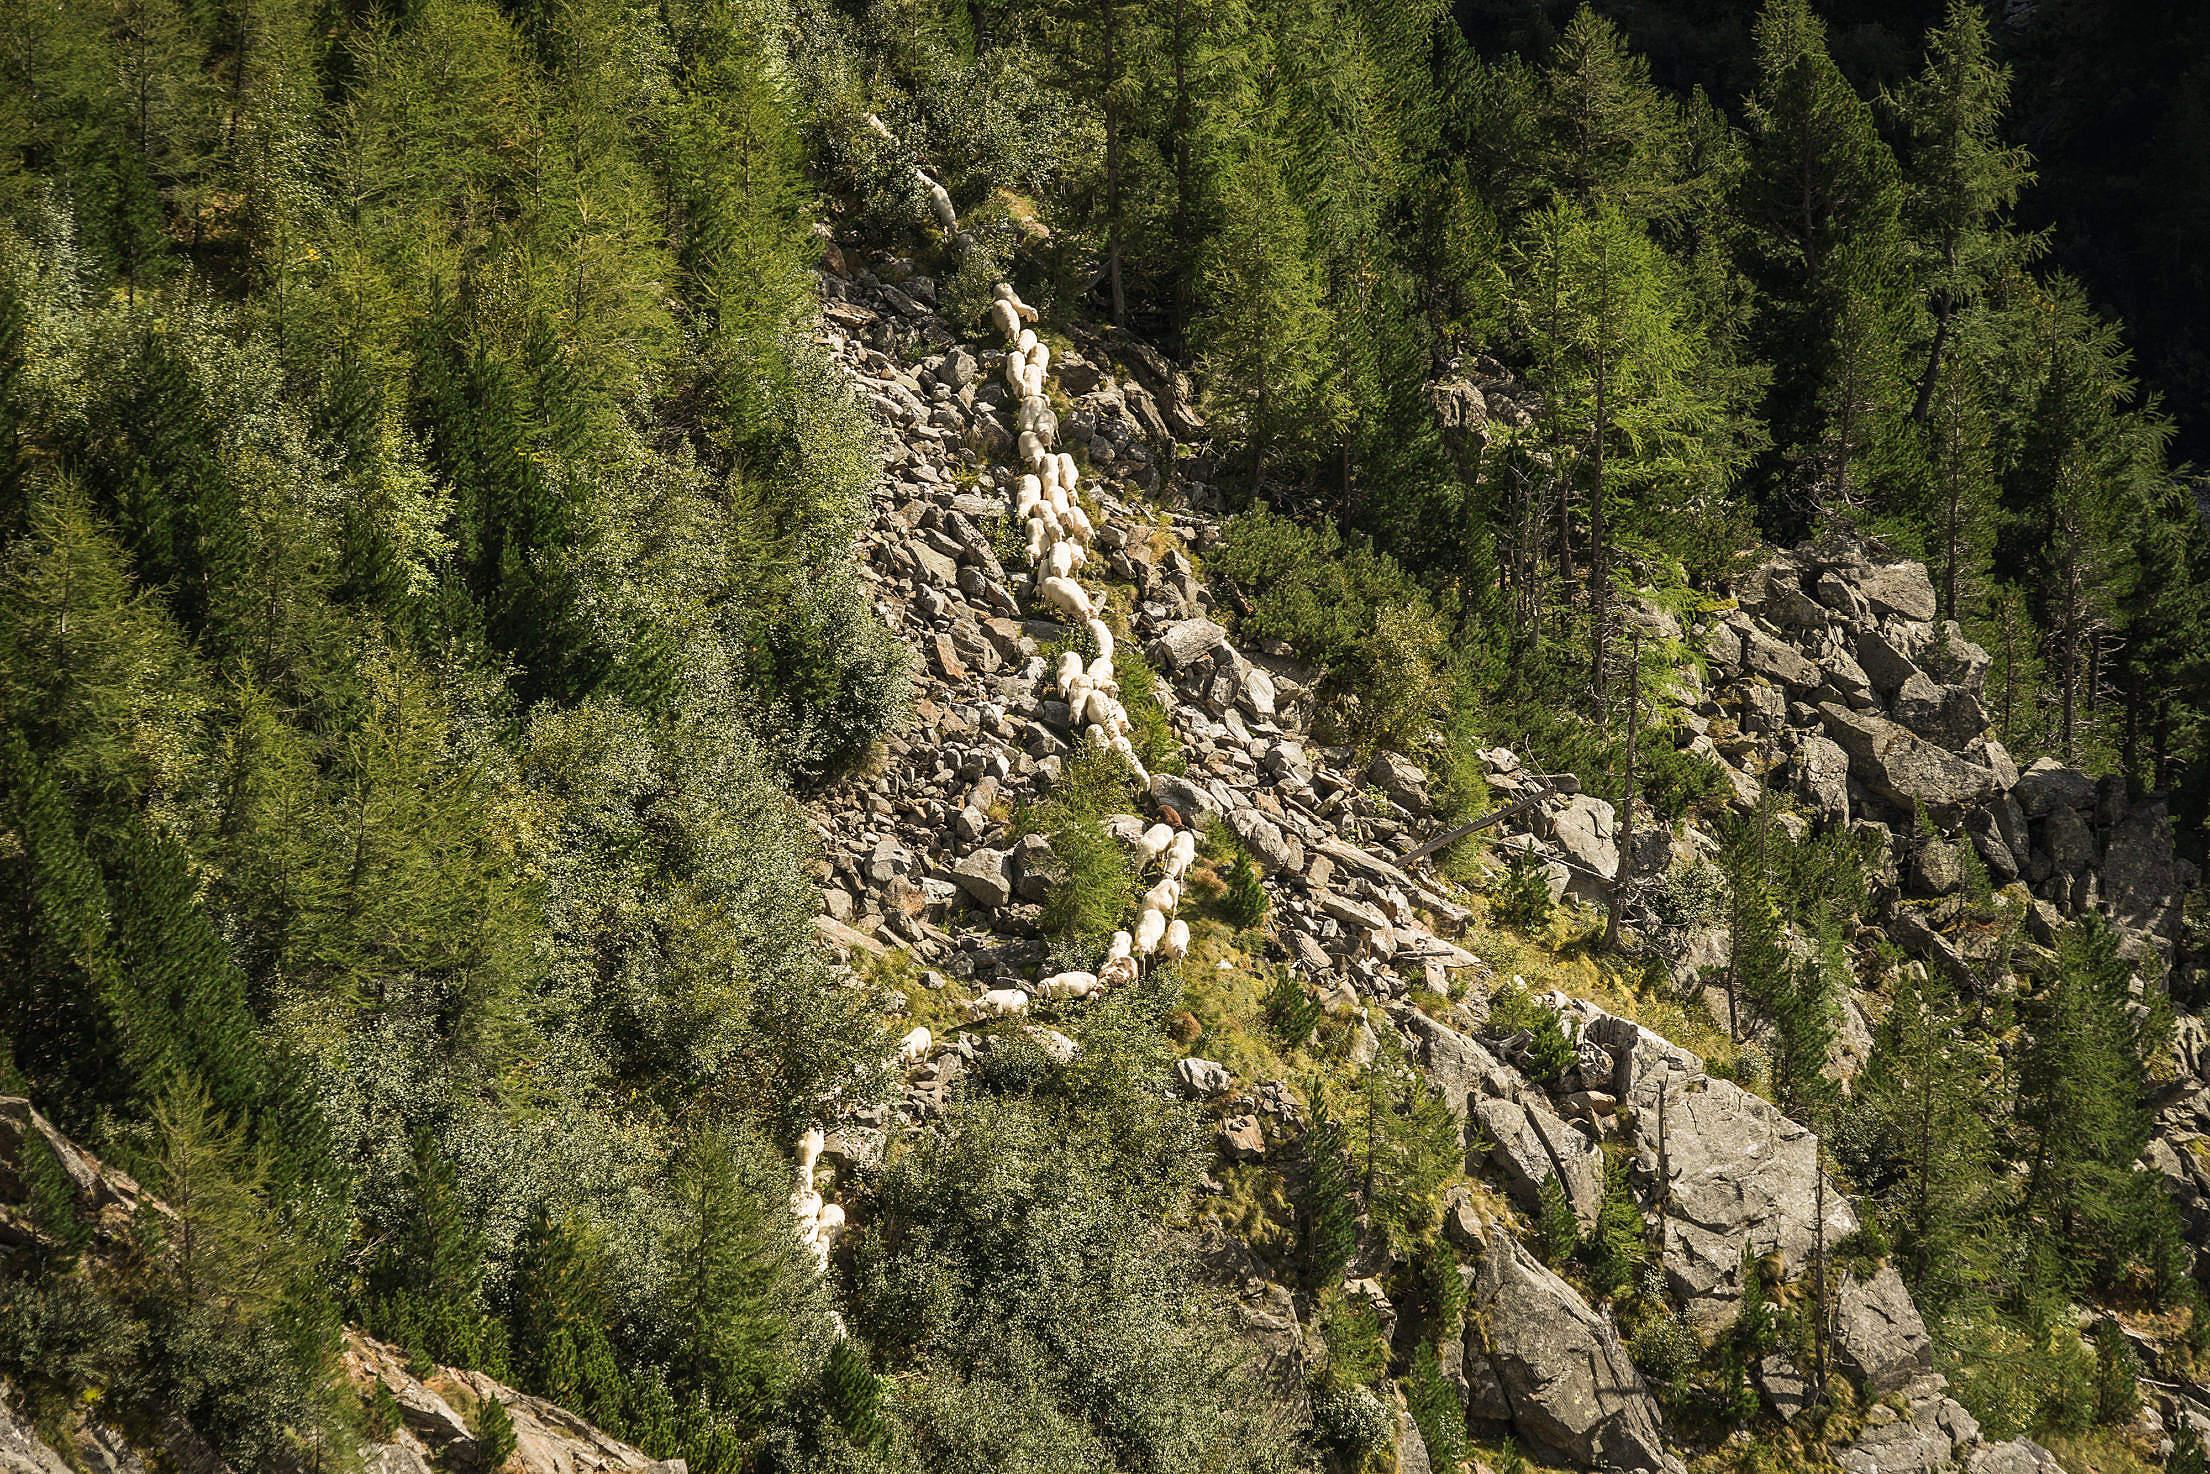 Flock of Sheep in Austrian Mountains Free Stock Photo